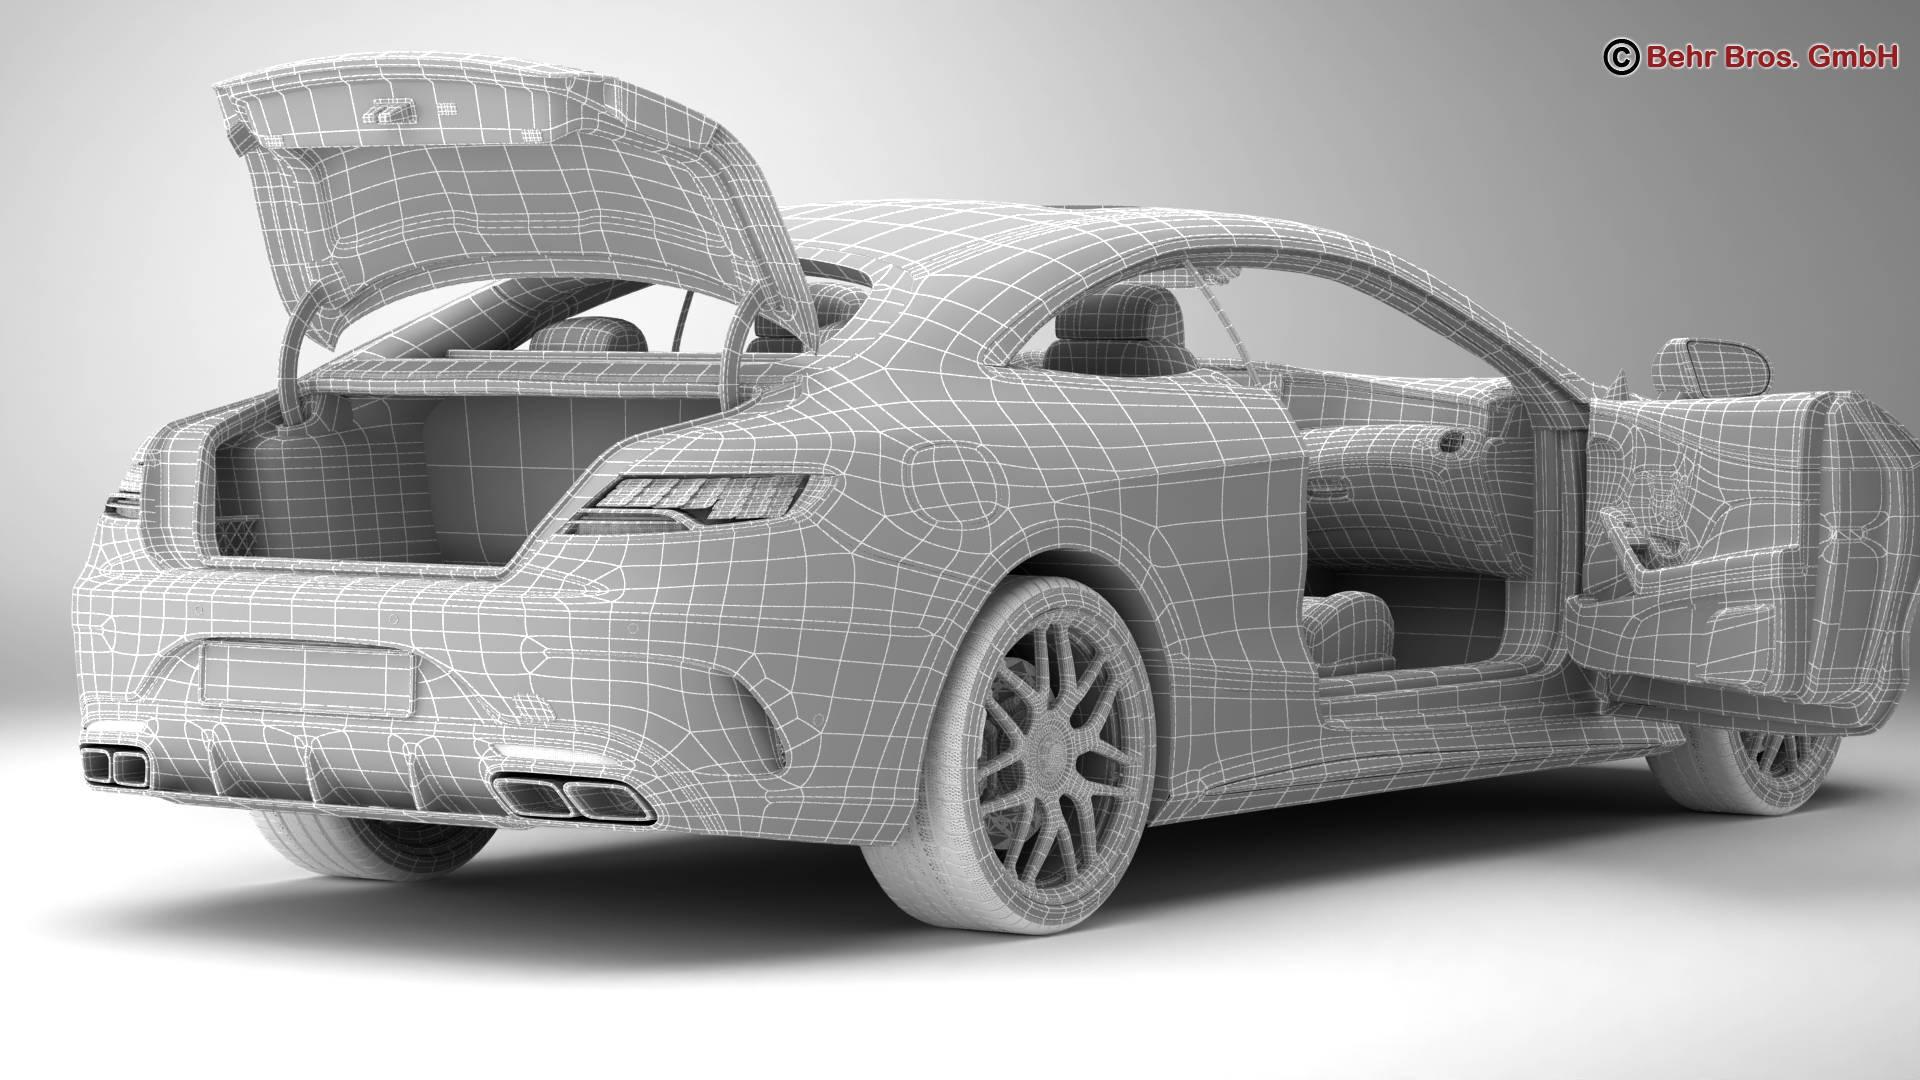 mercedes s class coupe amg s63 2018 3d model 3ds max fbx c4d lwo ma mb obj 274108